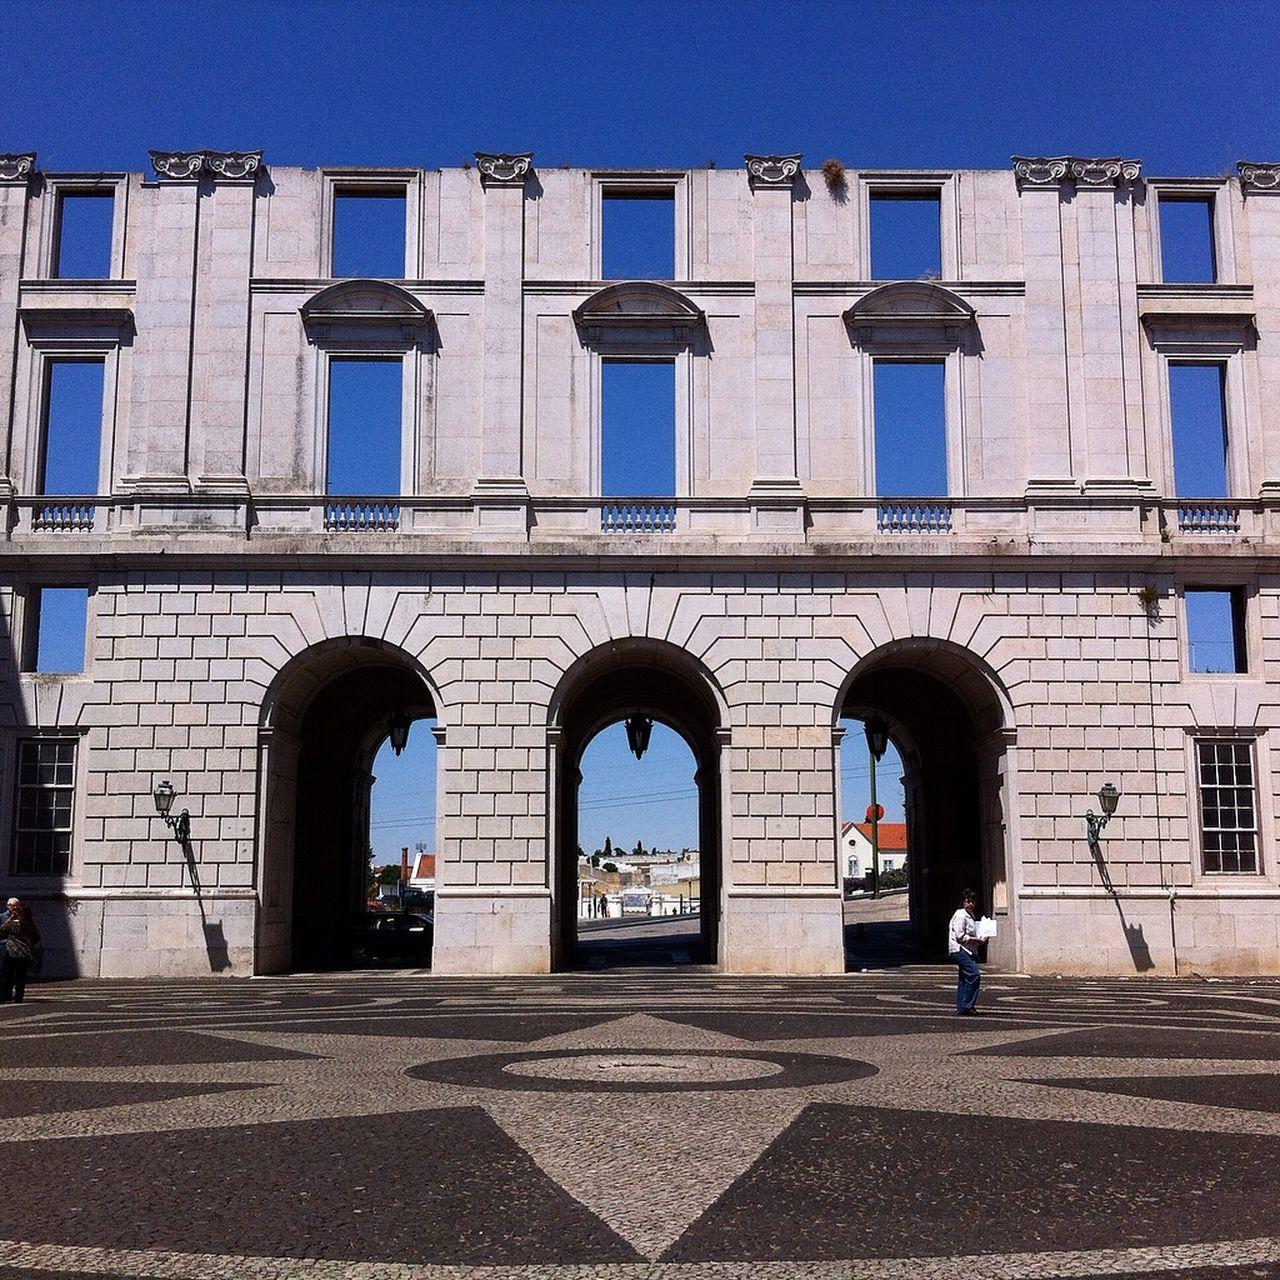 Palácio da Ajuda um Lisbon Palácionacionaldaajuda Palacioajuda Lisboa UNESCO World Heritage Site Amazing Architecture